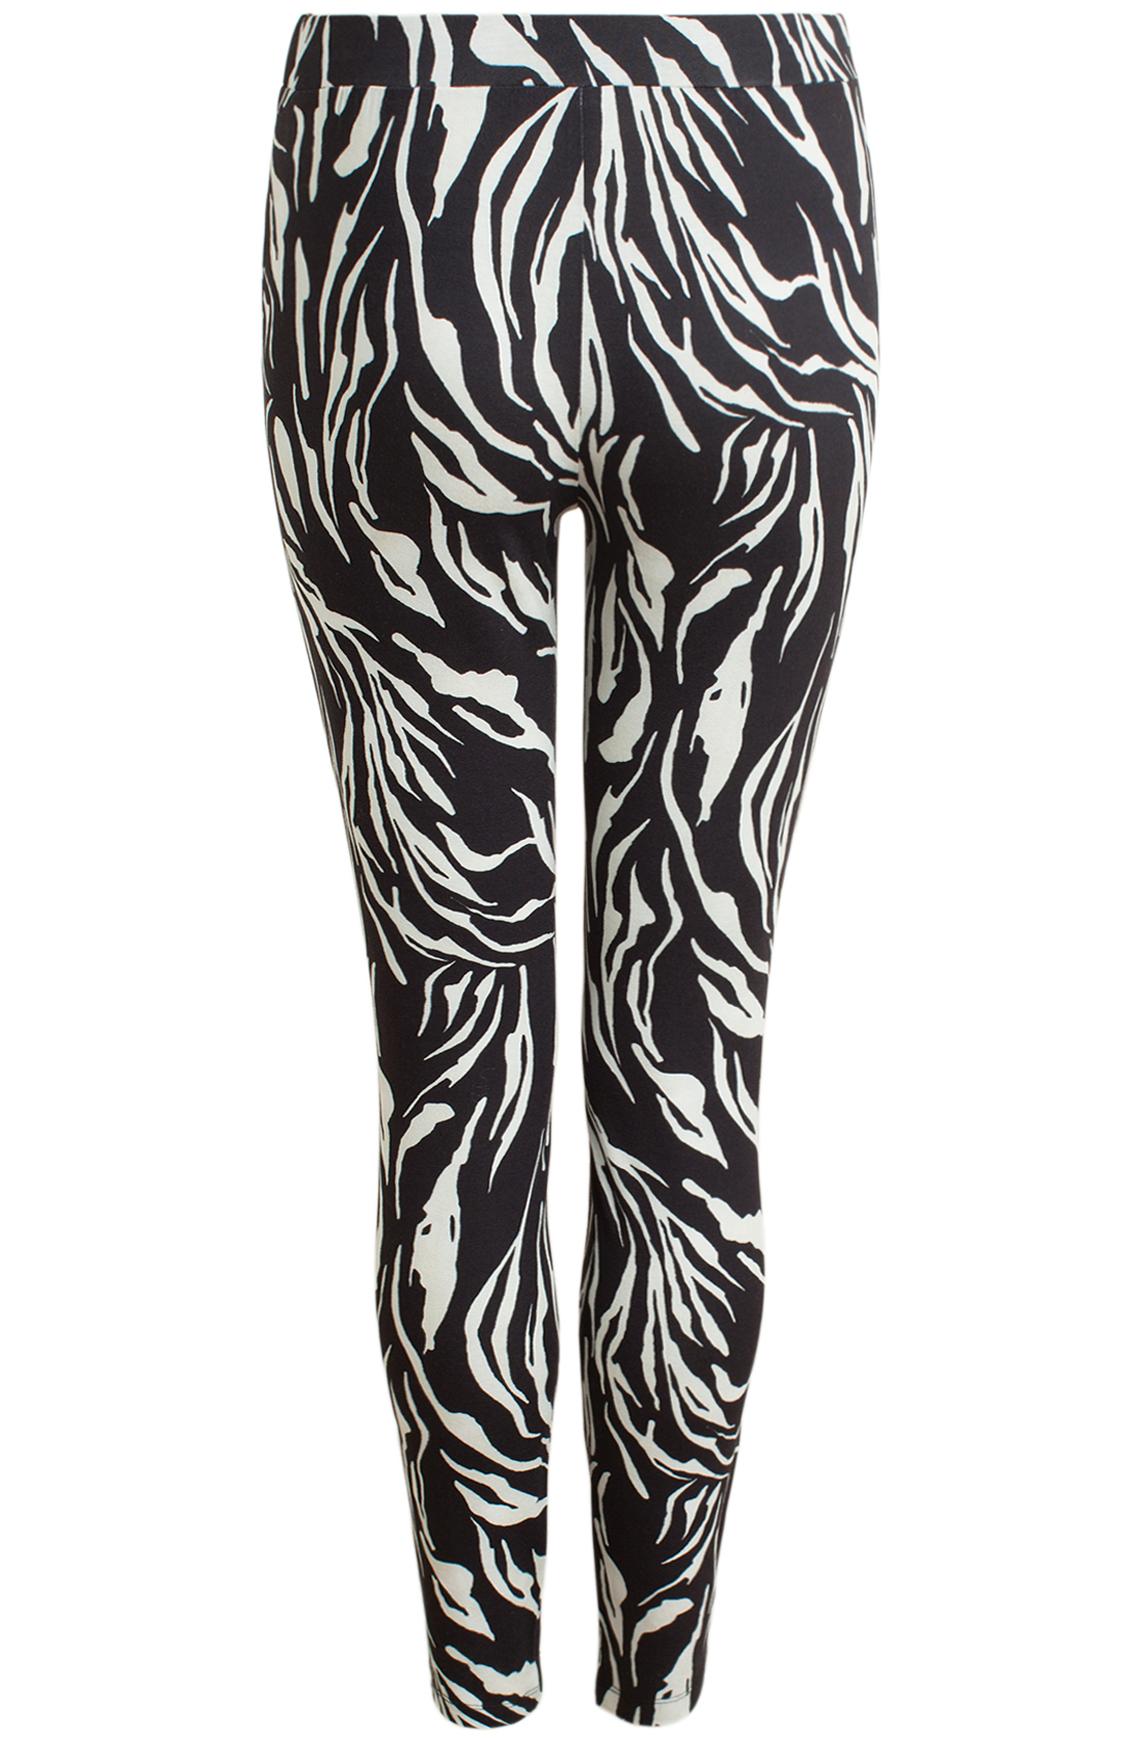 Anna Dames Zebraprint legging zwart